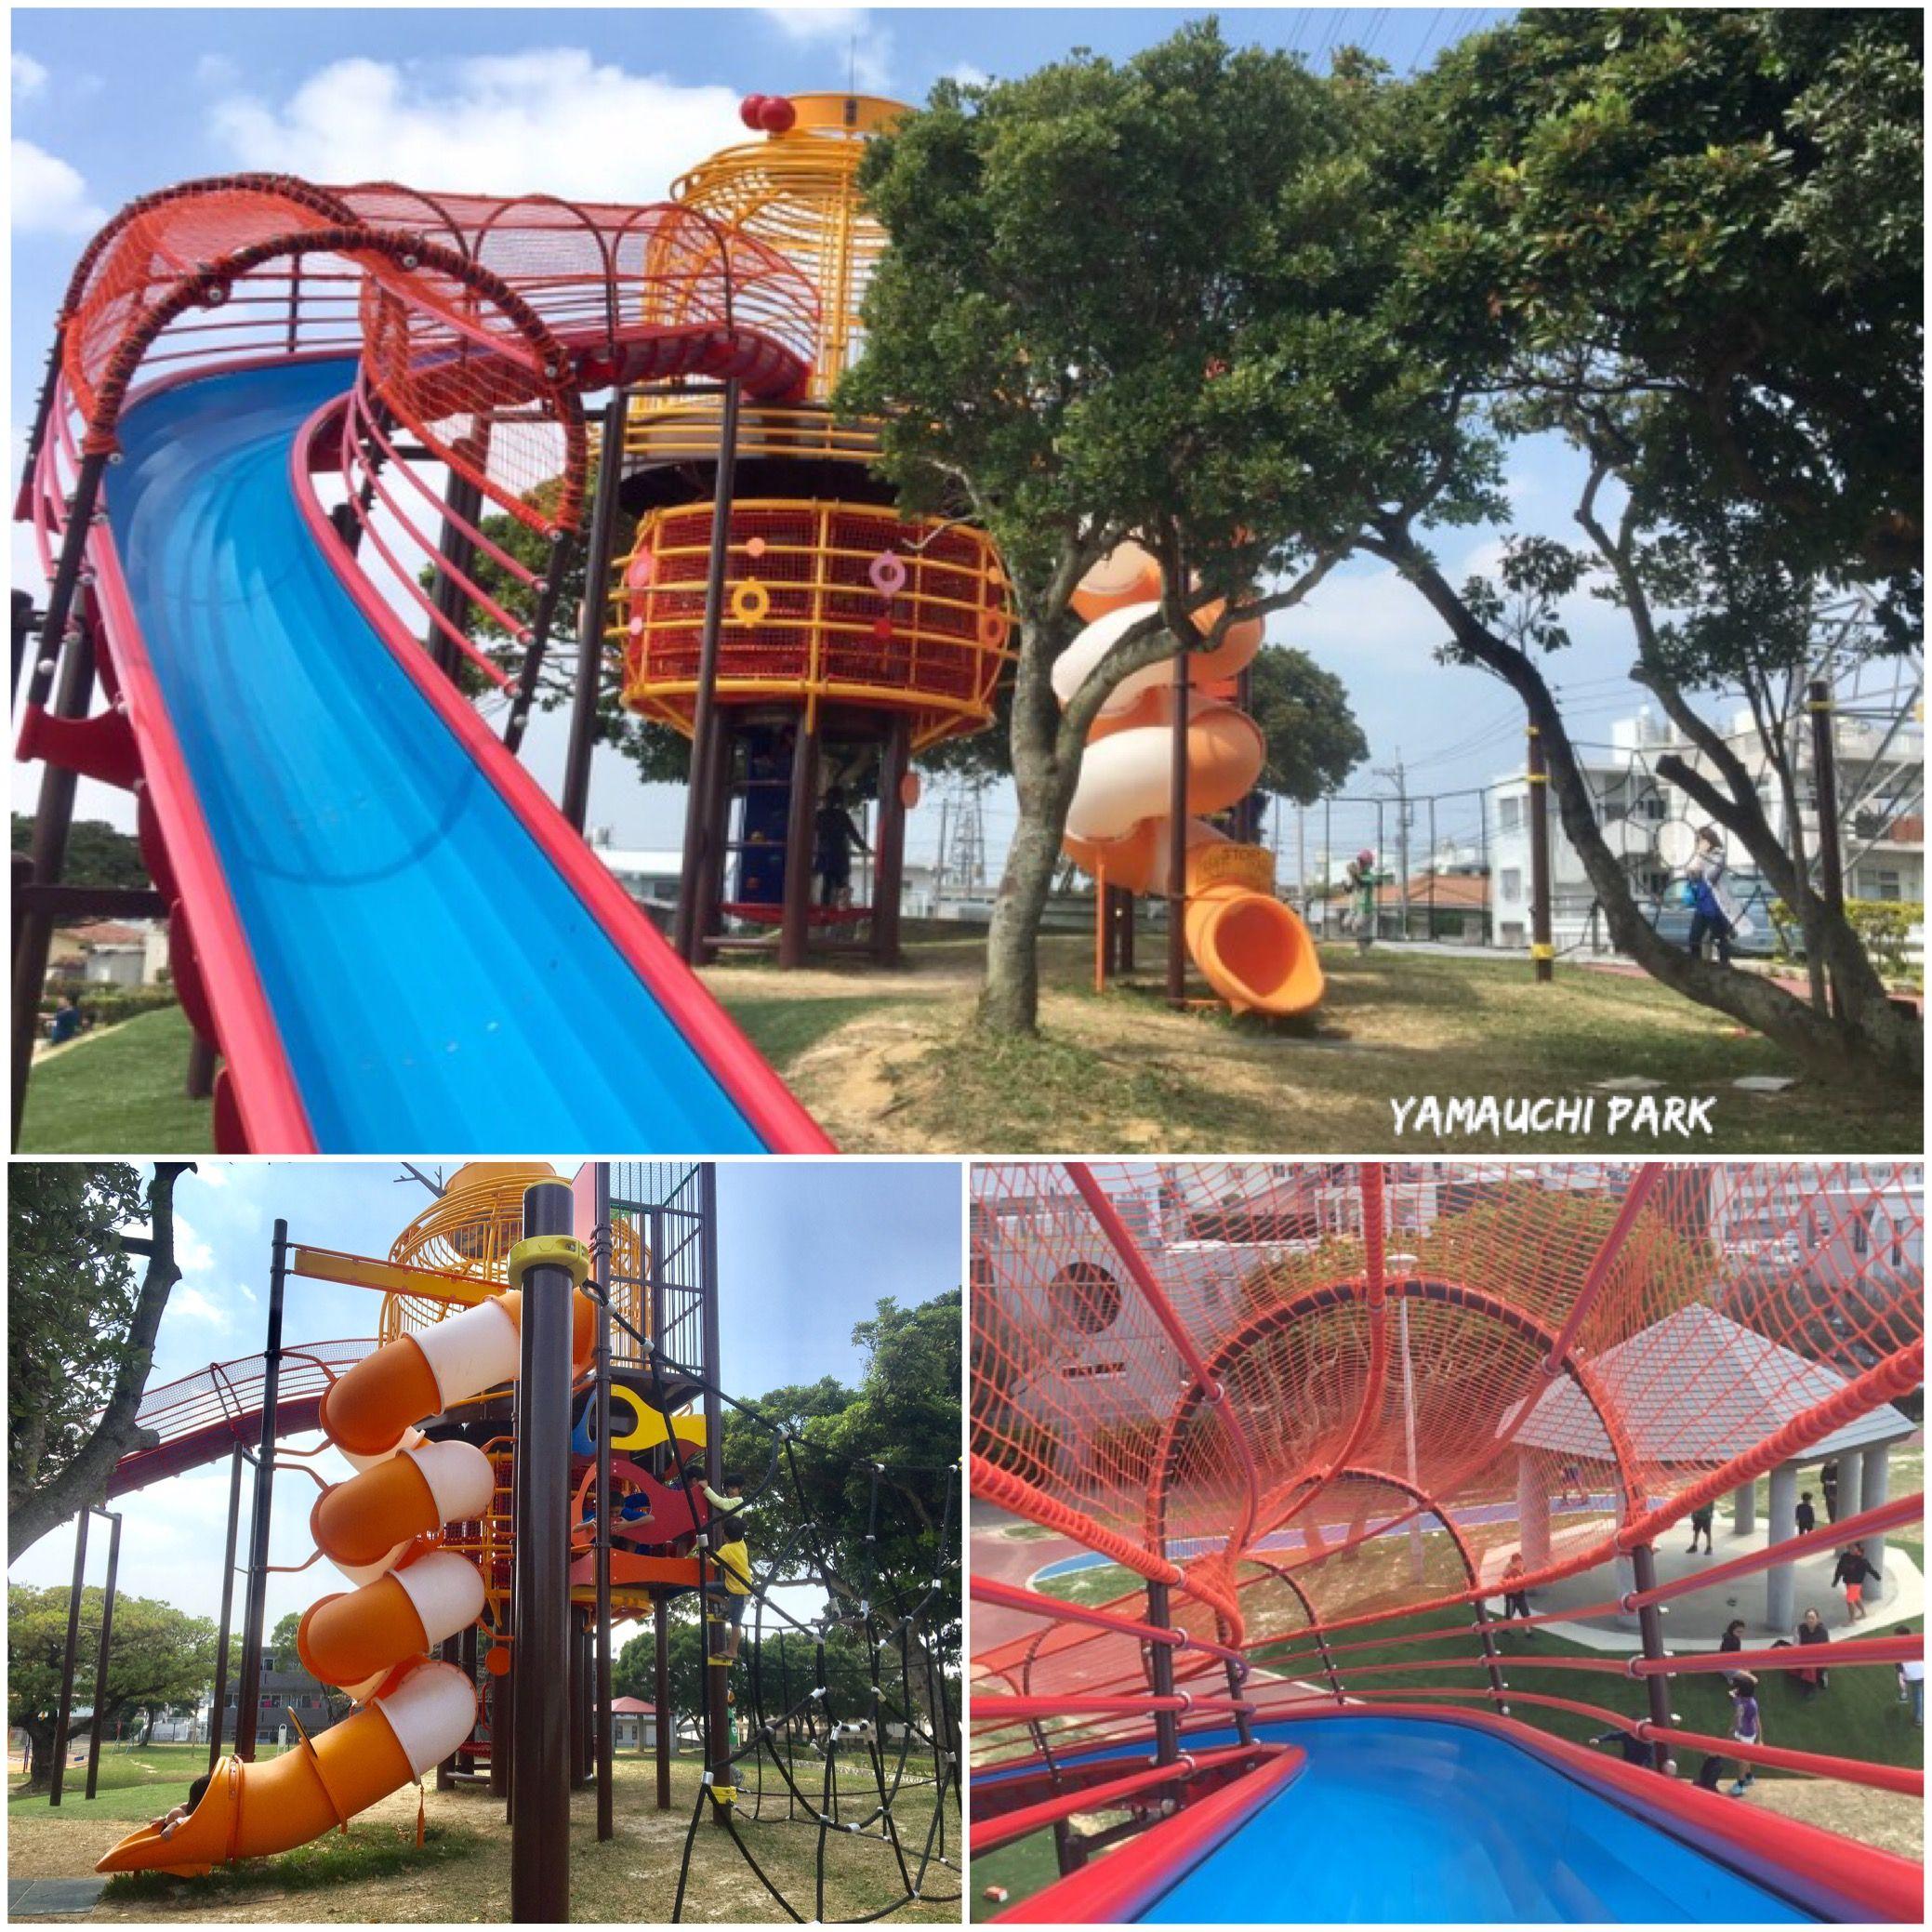 Japan Latest News Update: Park Update: New Equipment At Yamauchi Park. Local